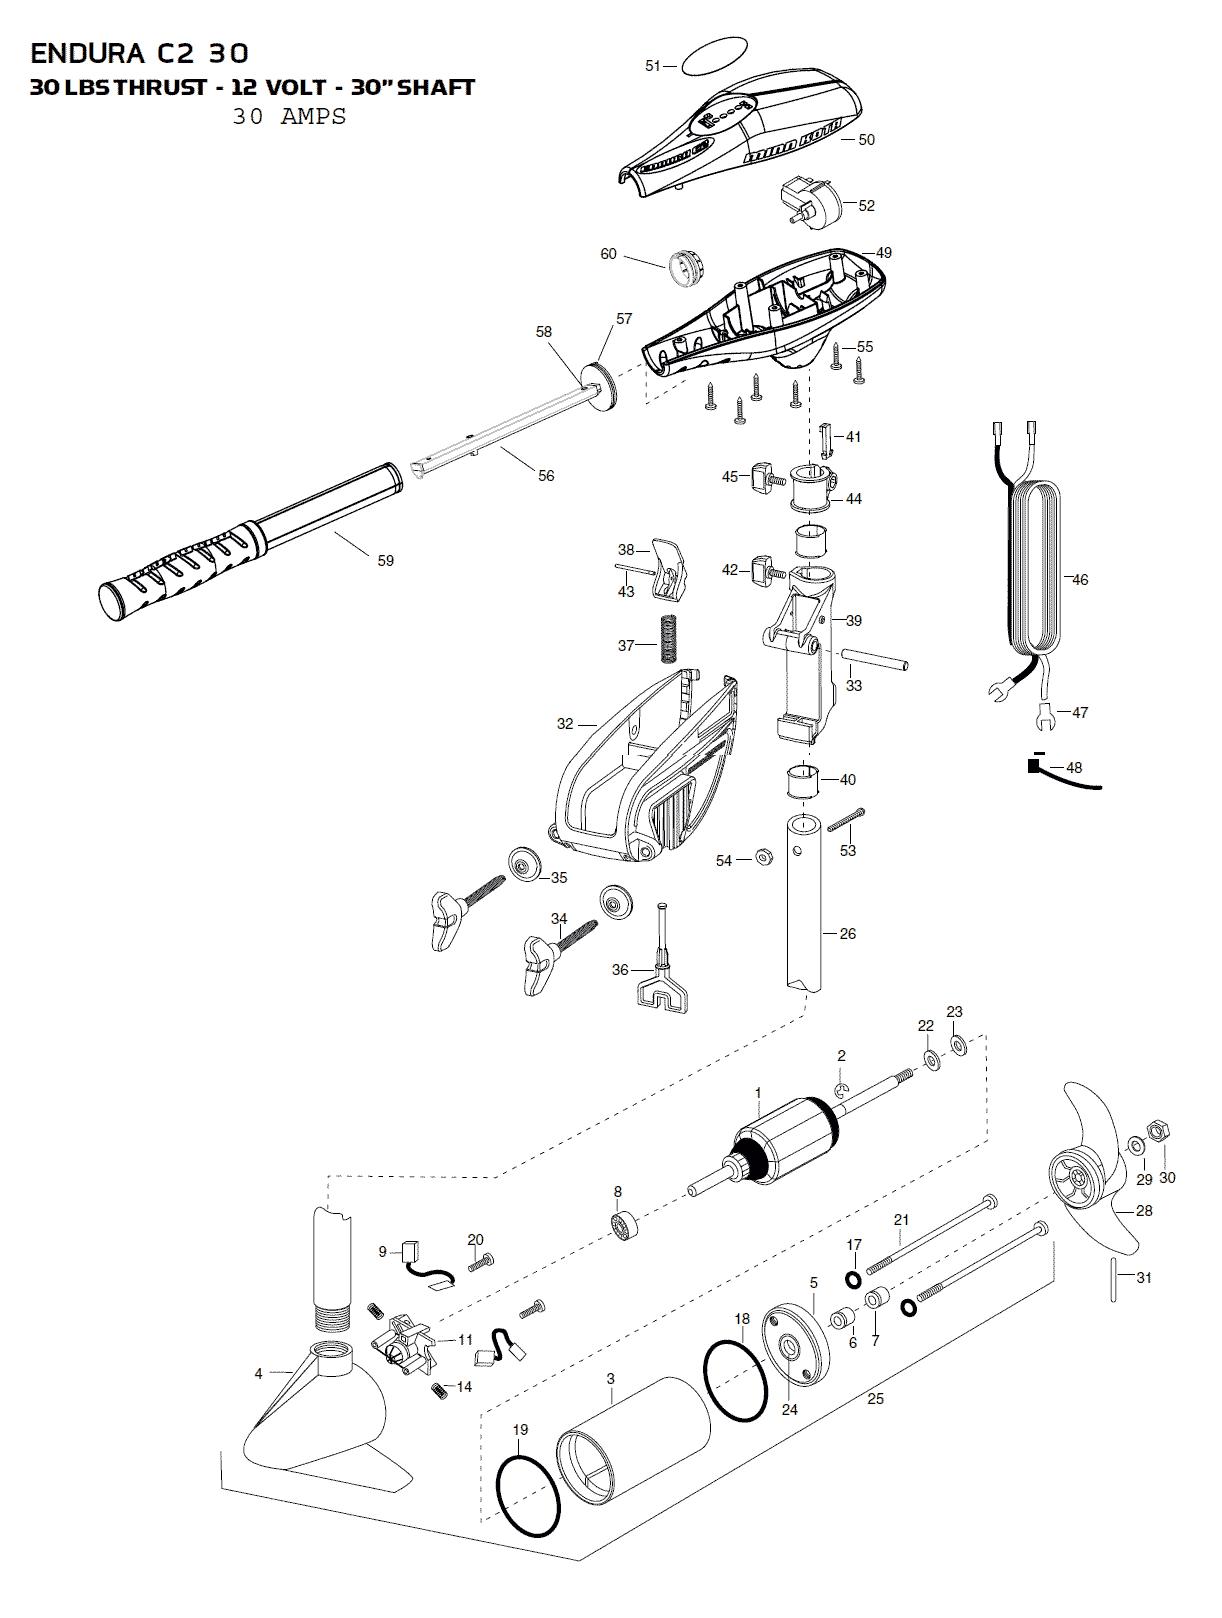 Minn Kota Endura C2 30 Parts